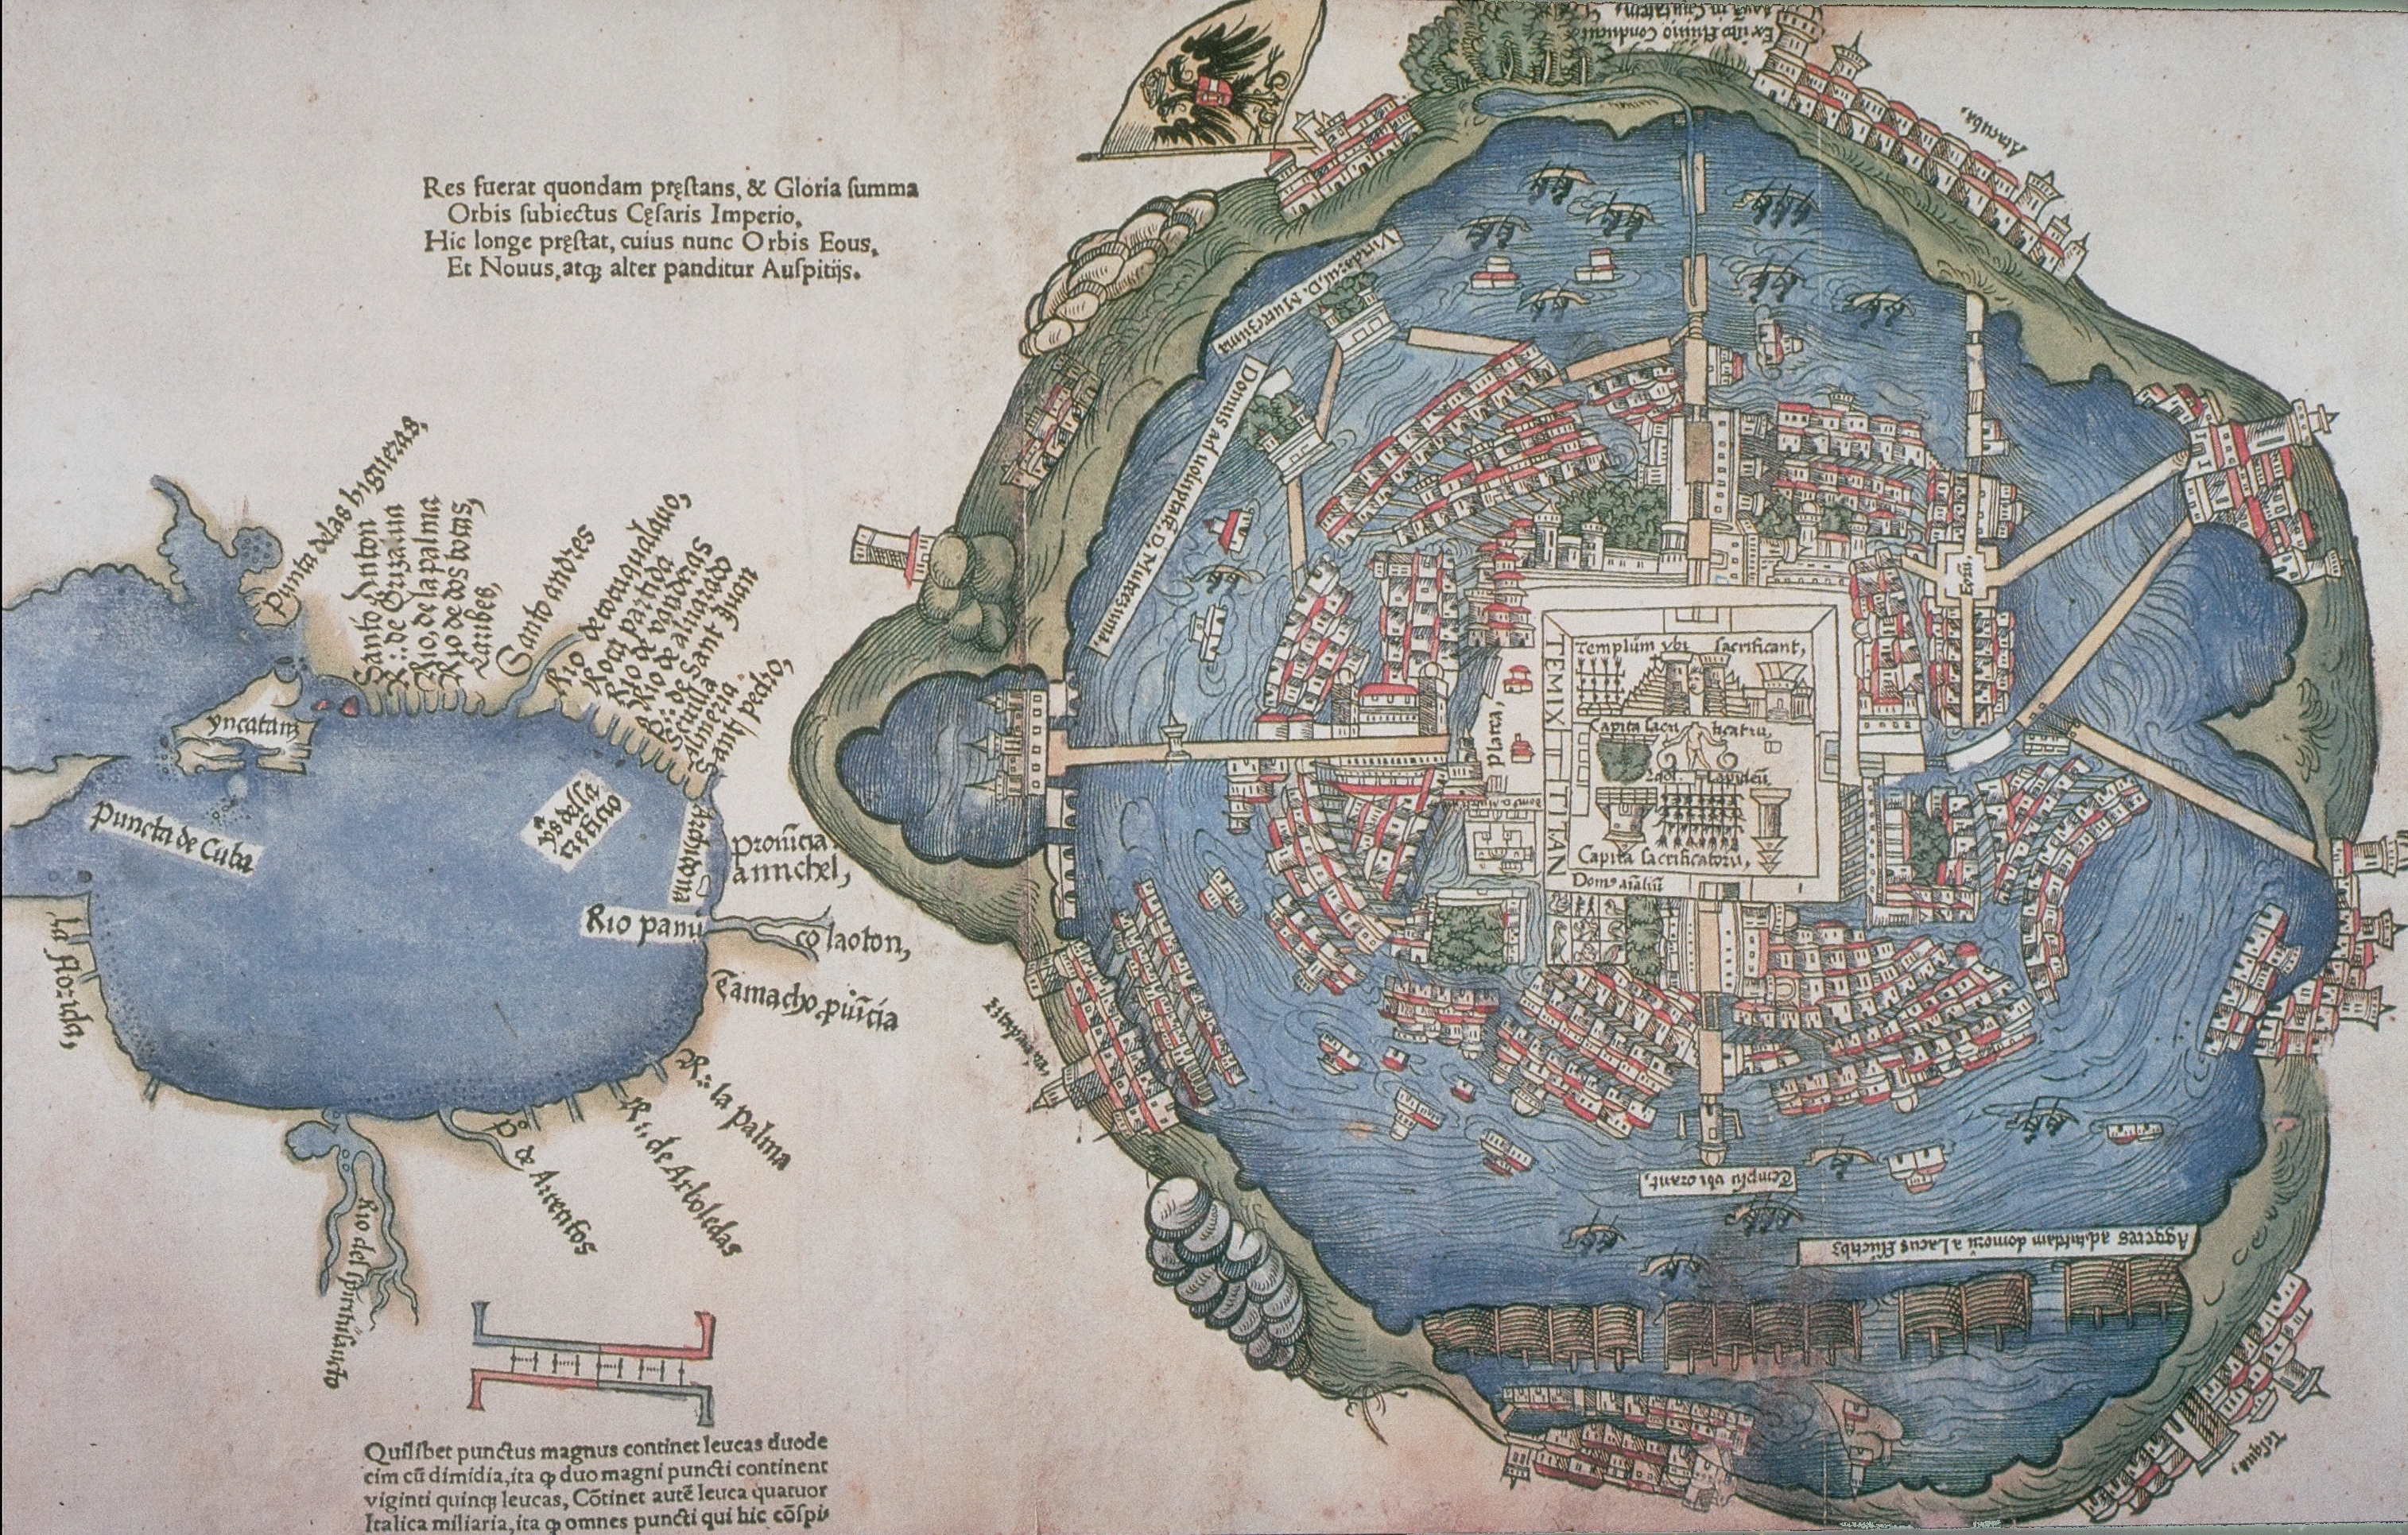 File:Map of Tenochtitlan, 1524.jpg - Wikimedia Commons